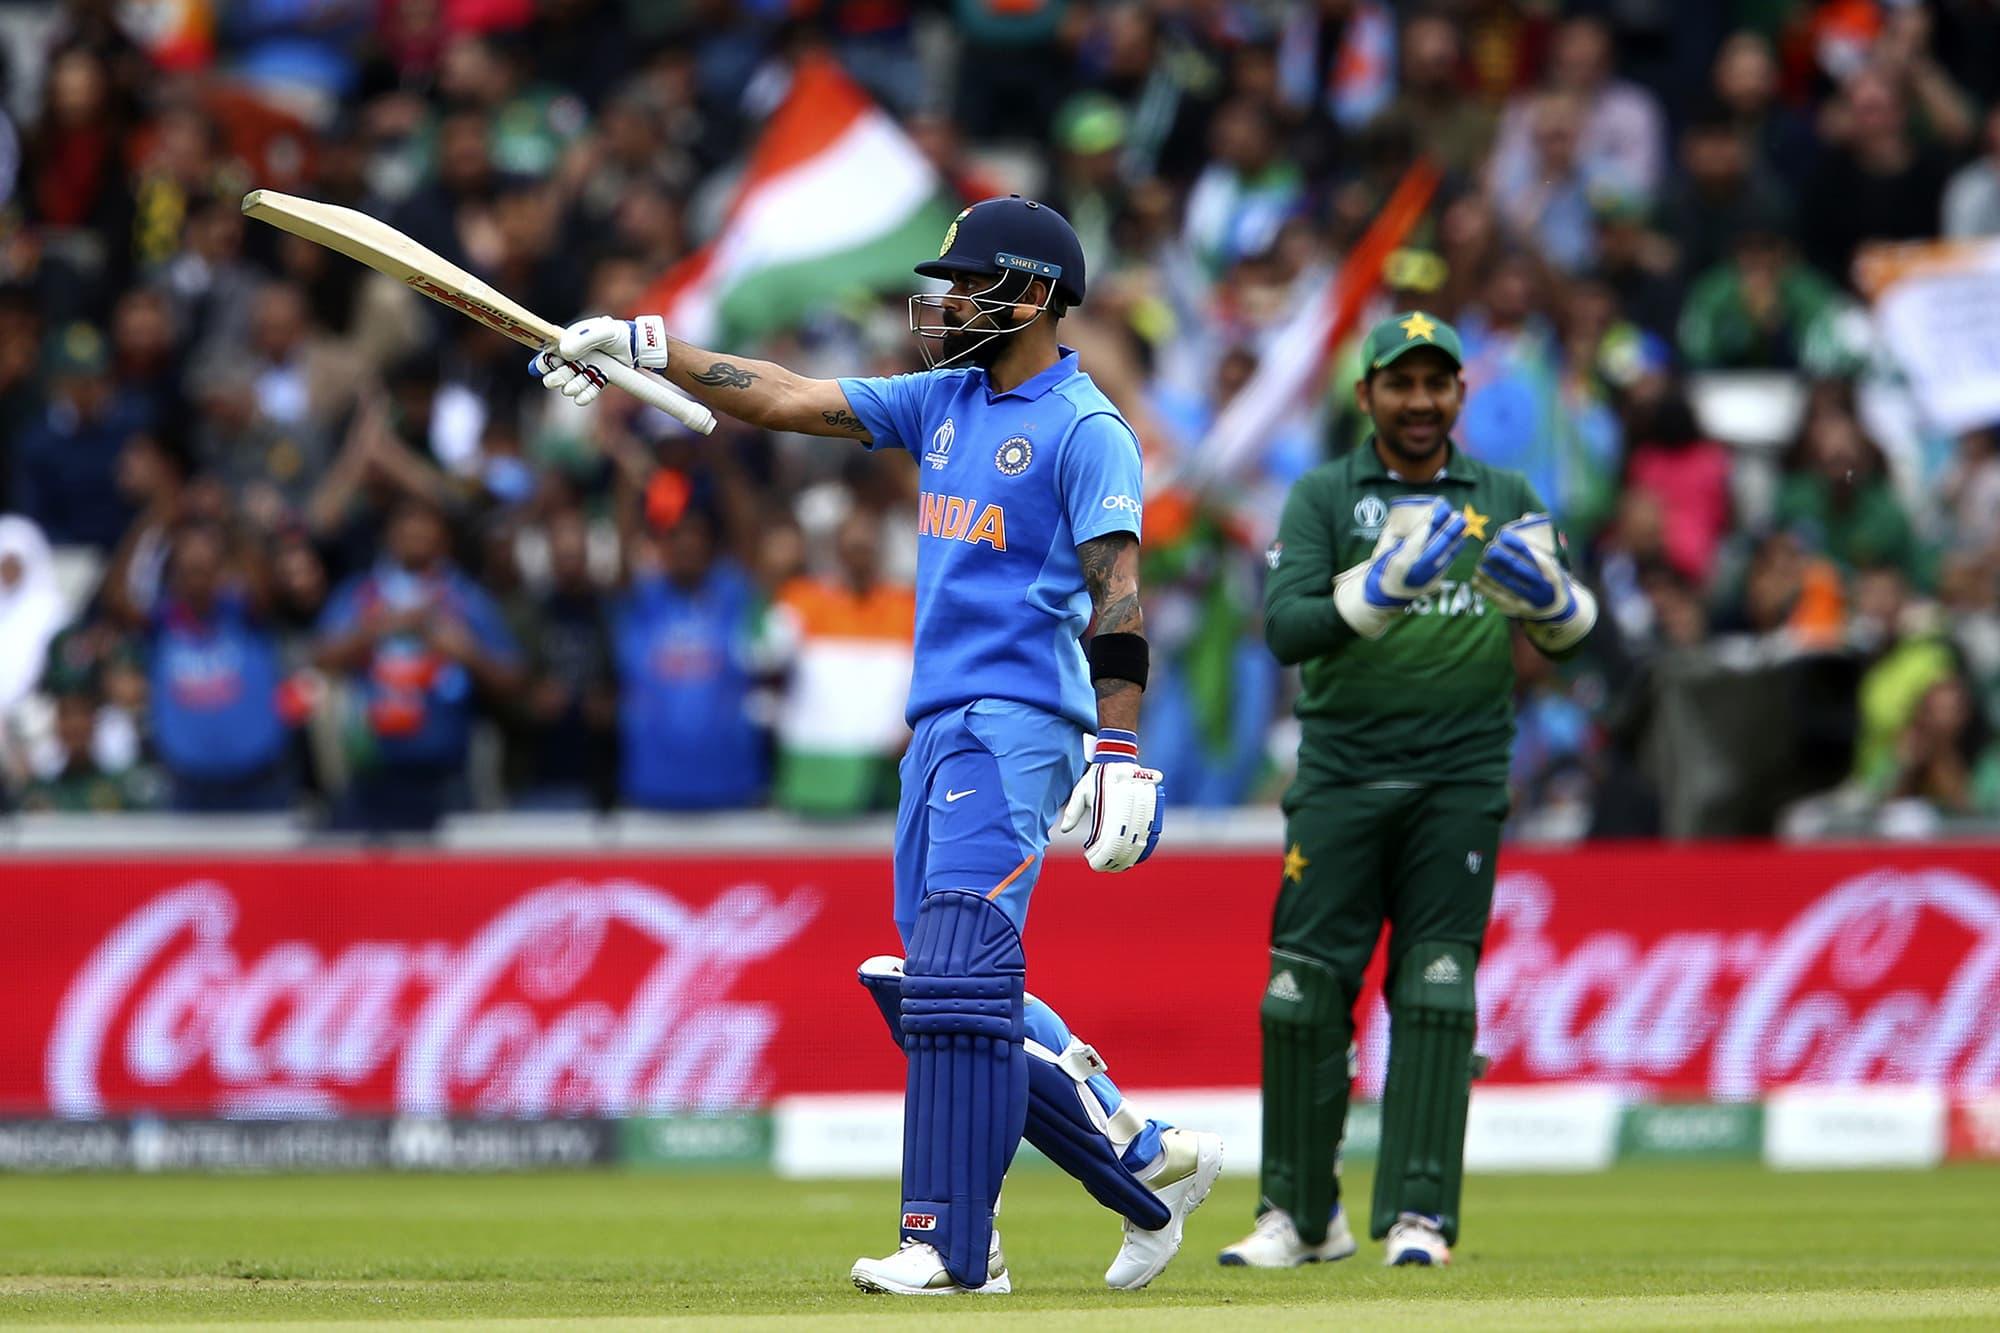 Virat Kohli celebrates reaching a half-century. ─ AP